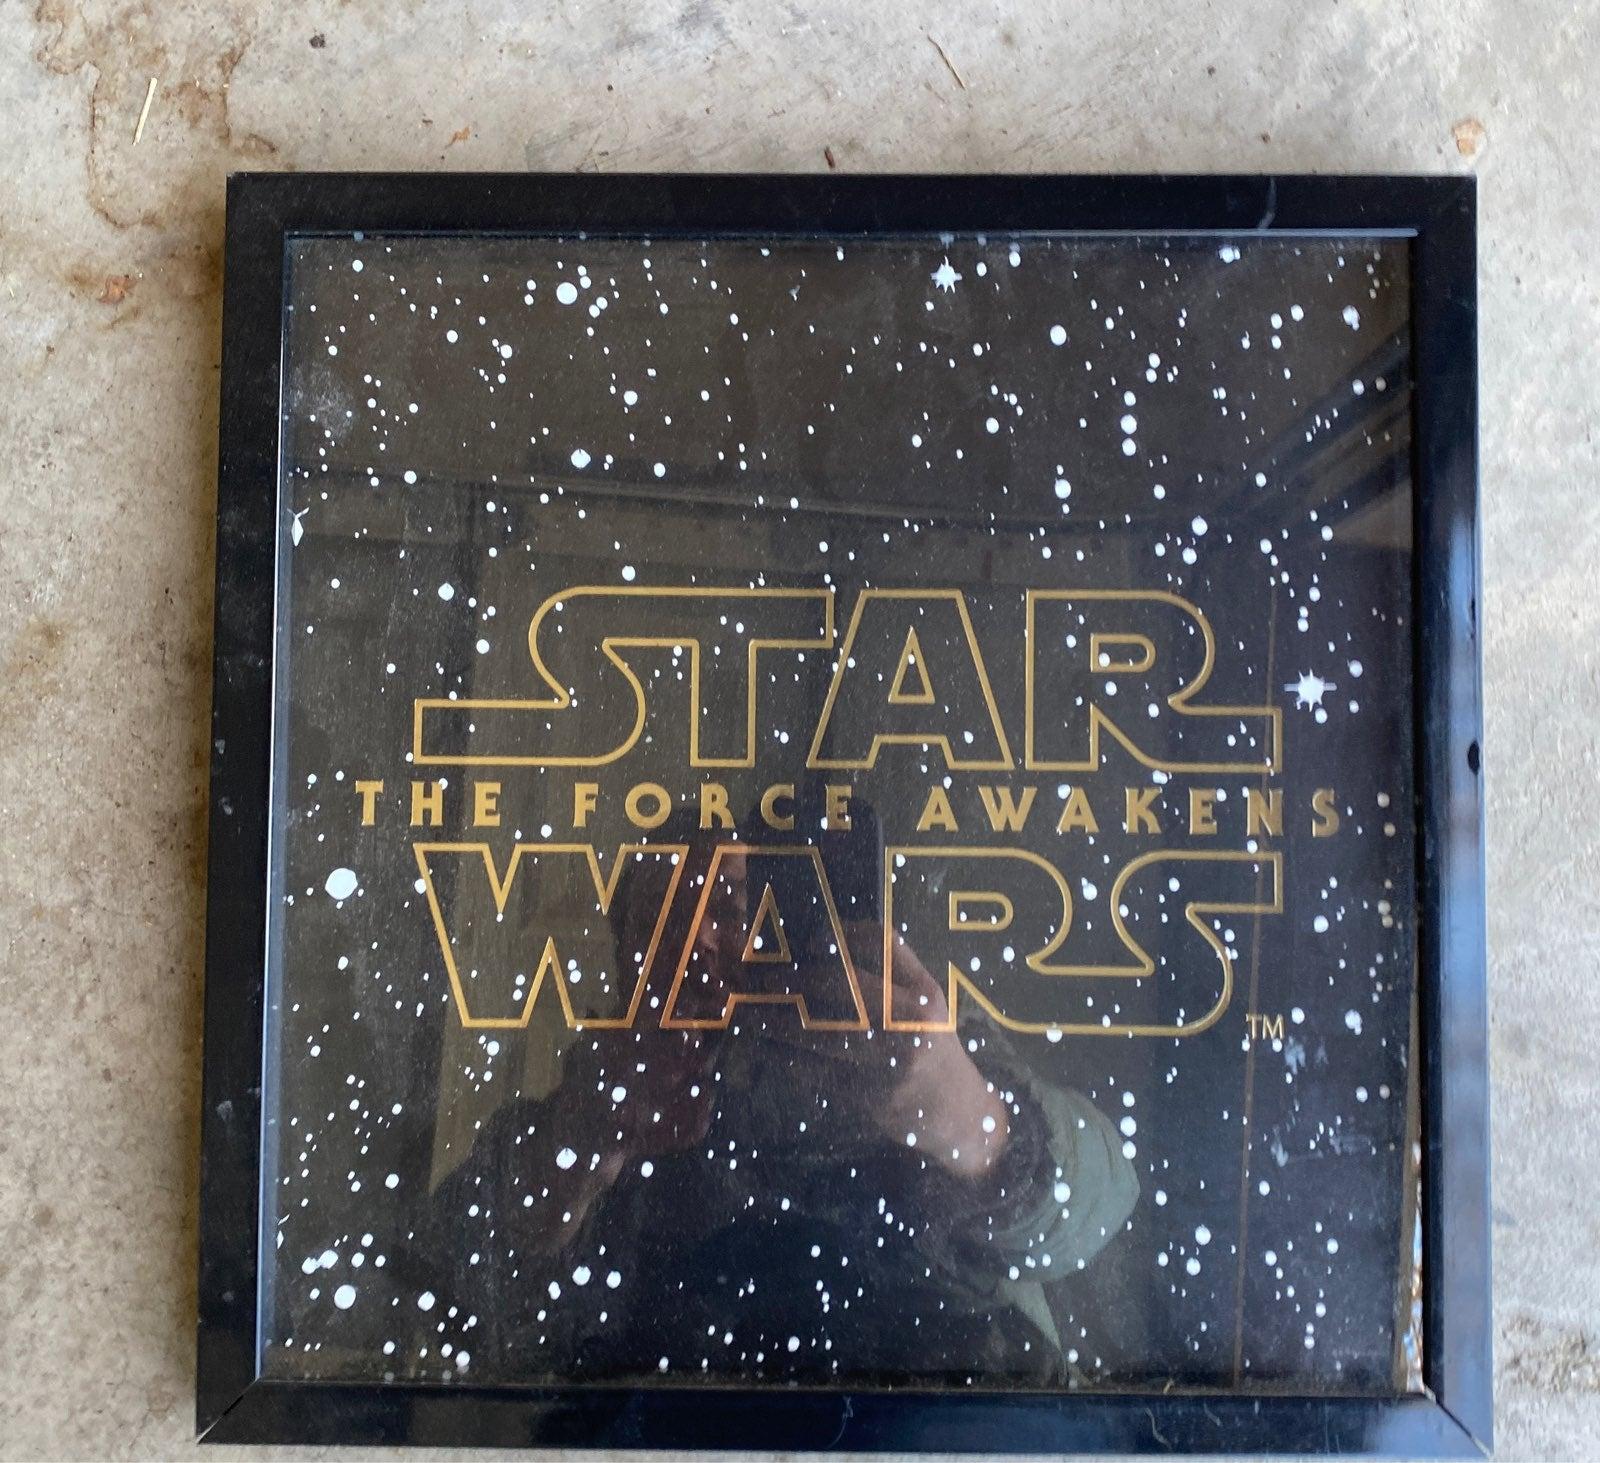 Star Wars Force Awakens sign